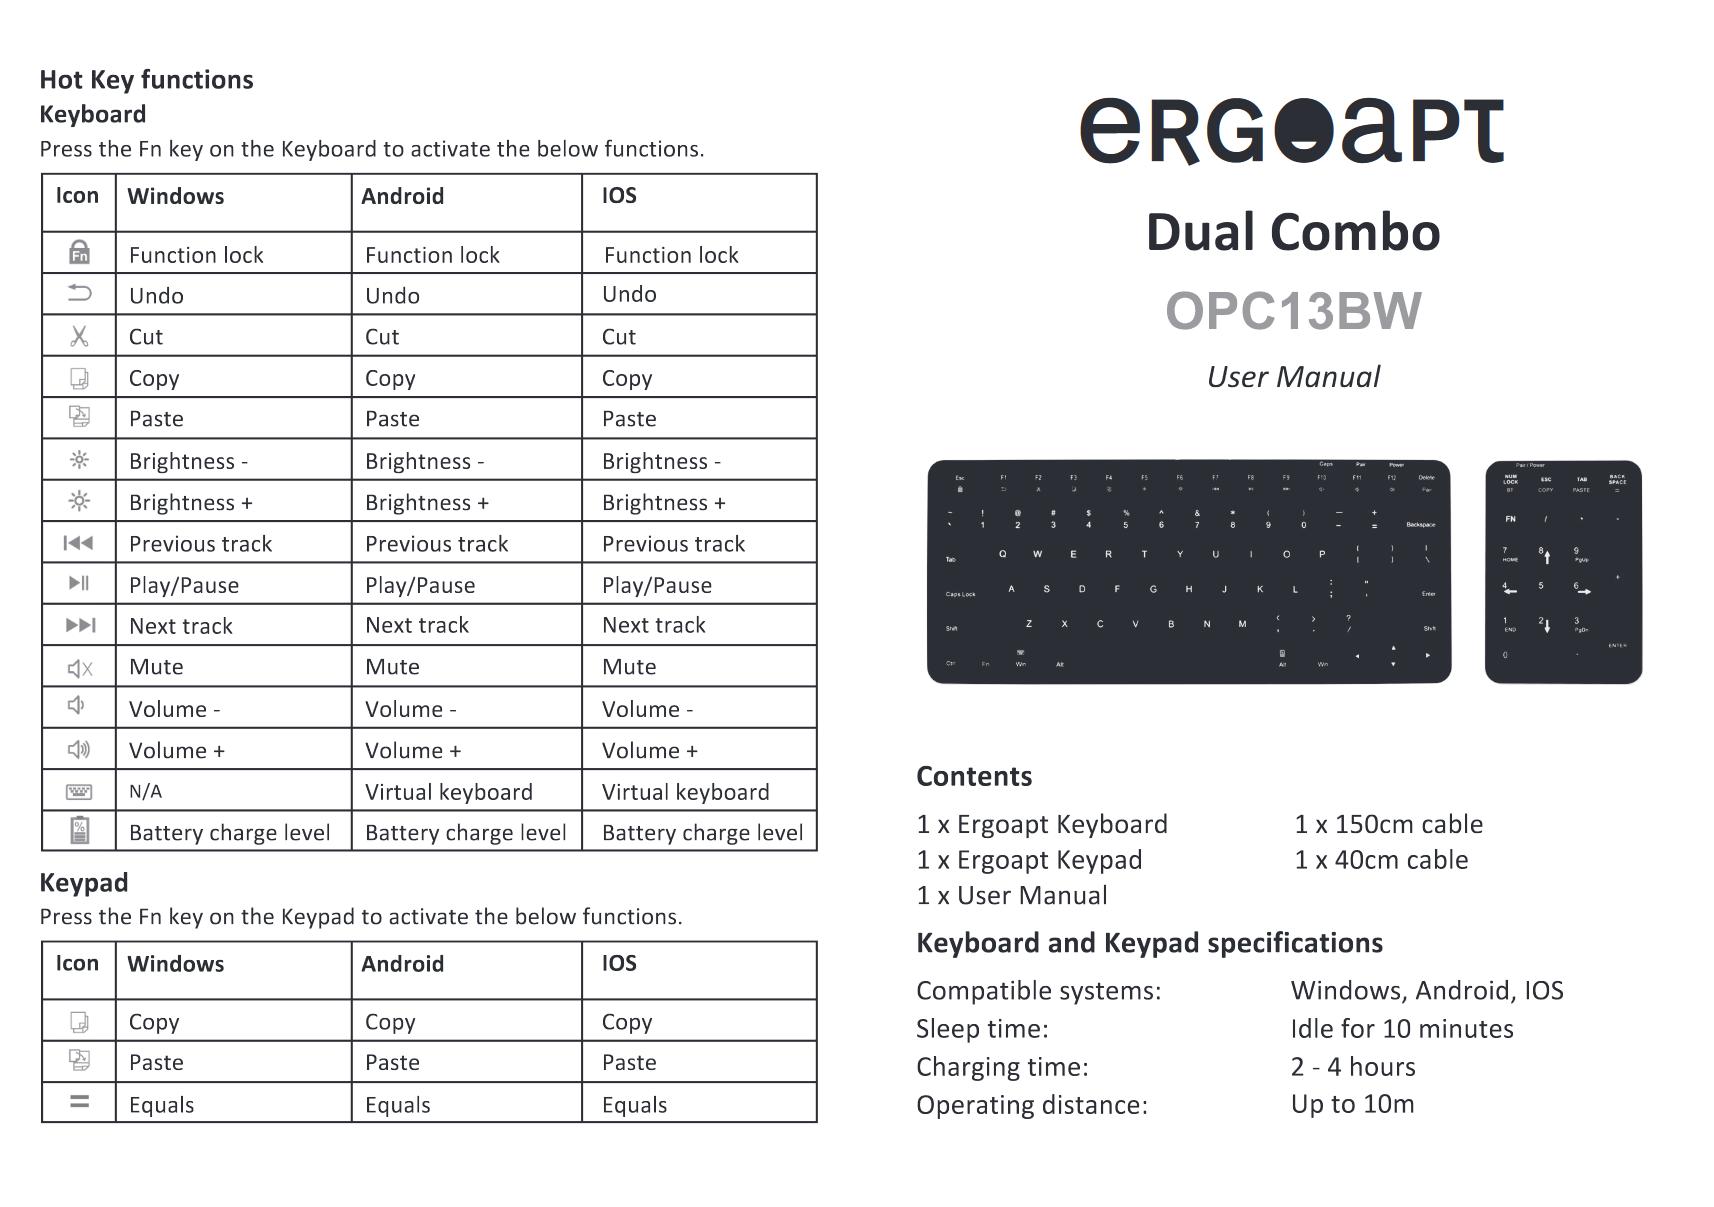 Ergoapt Dual Combo